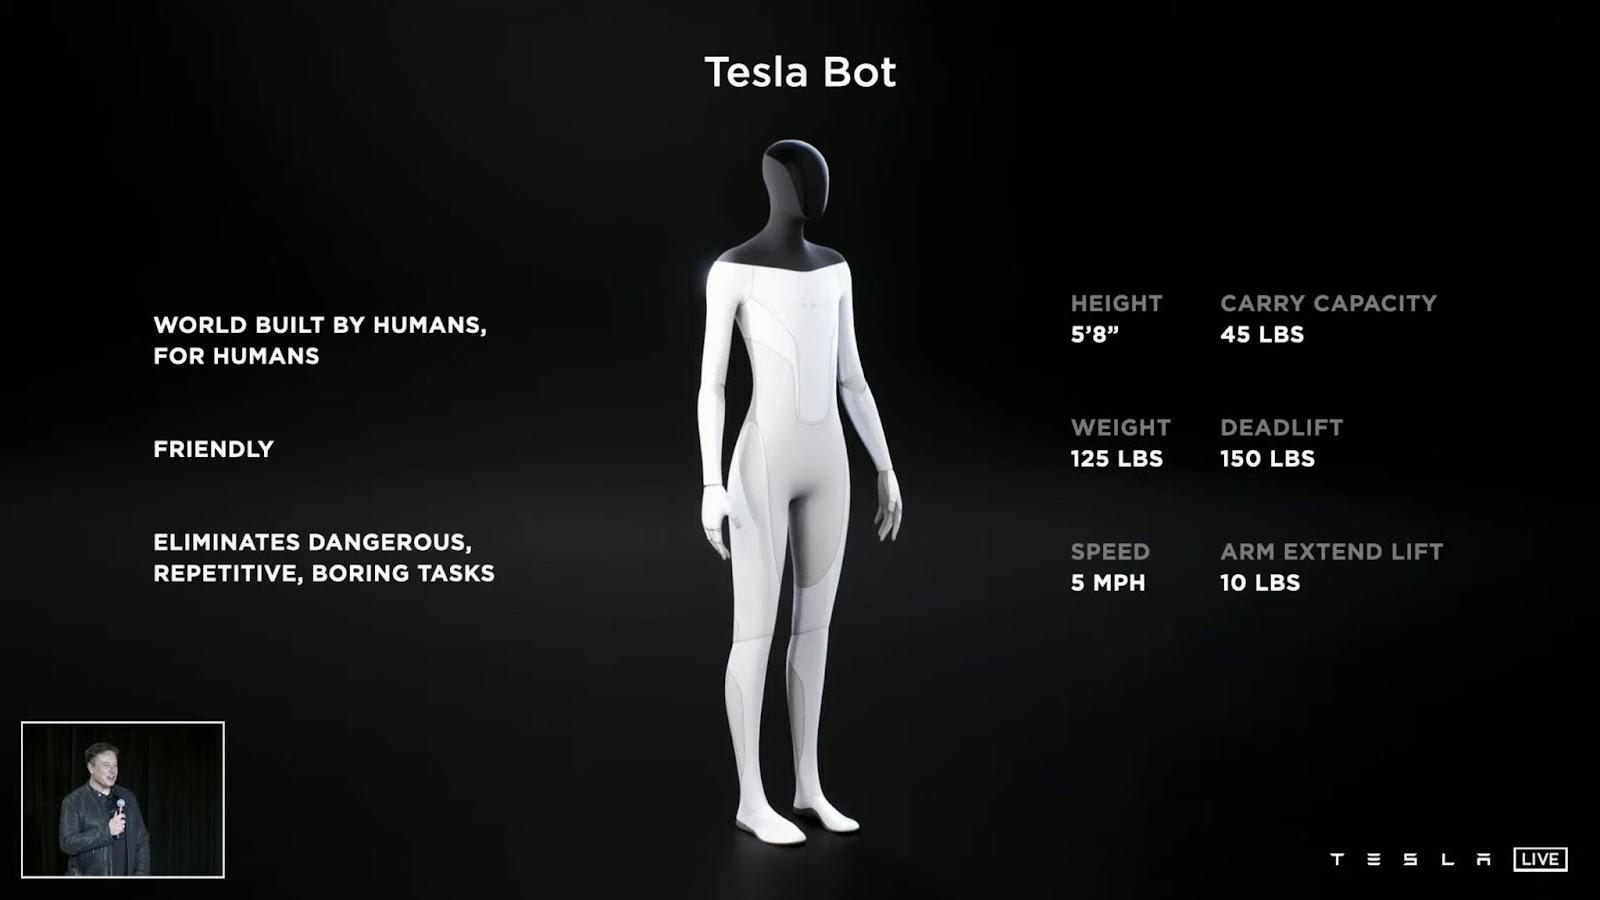 Características del robot humanoide de Tesla